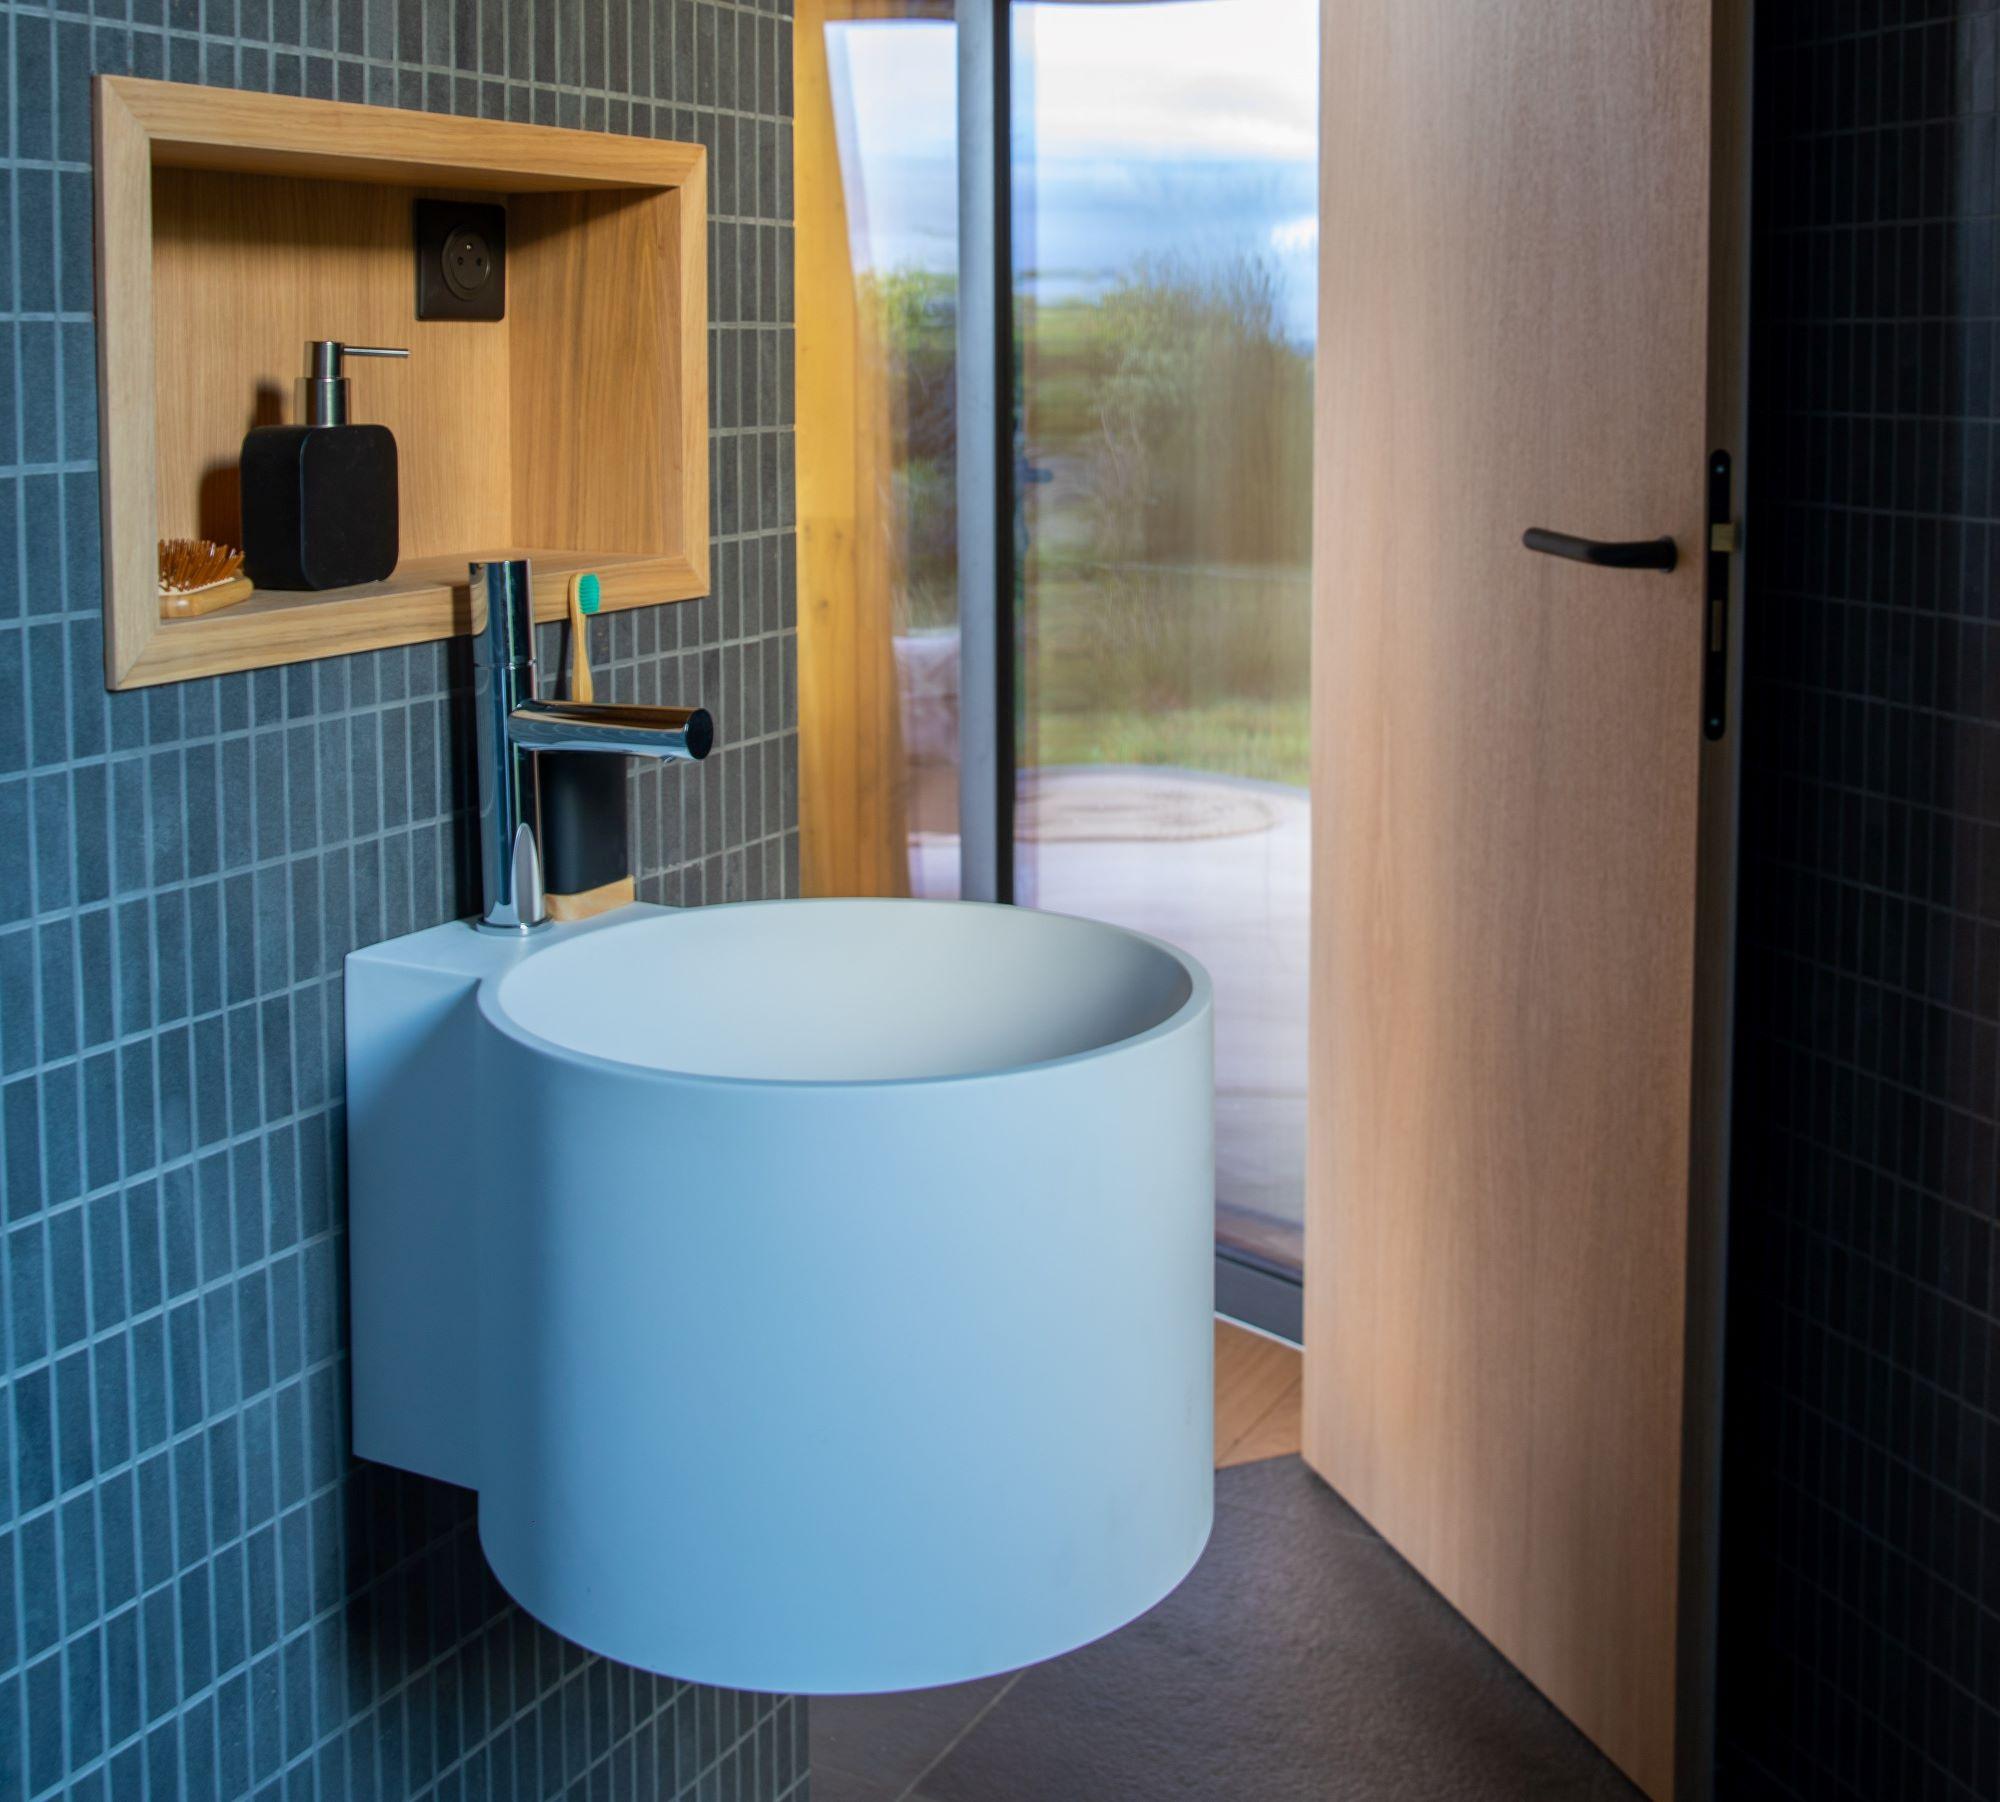 lumipod bathroom, jornet's airbnb